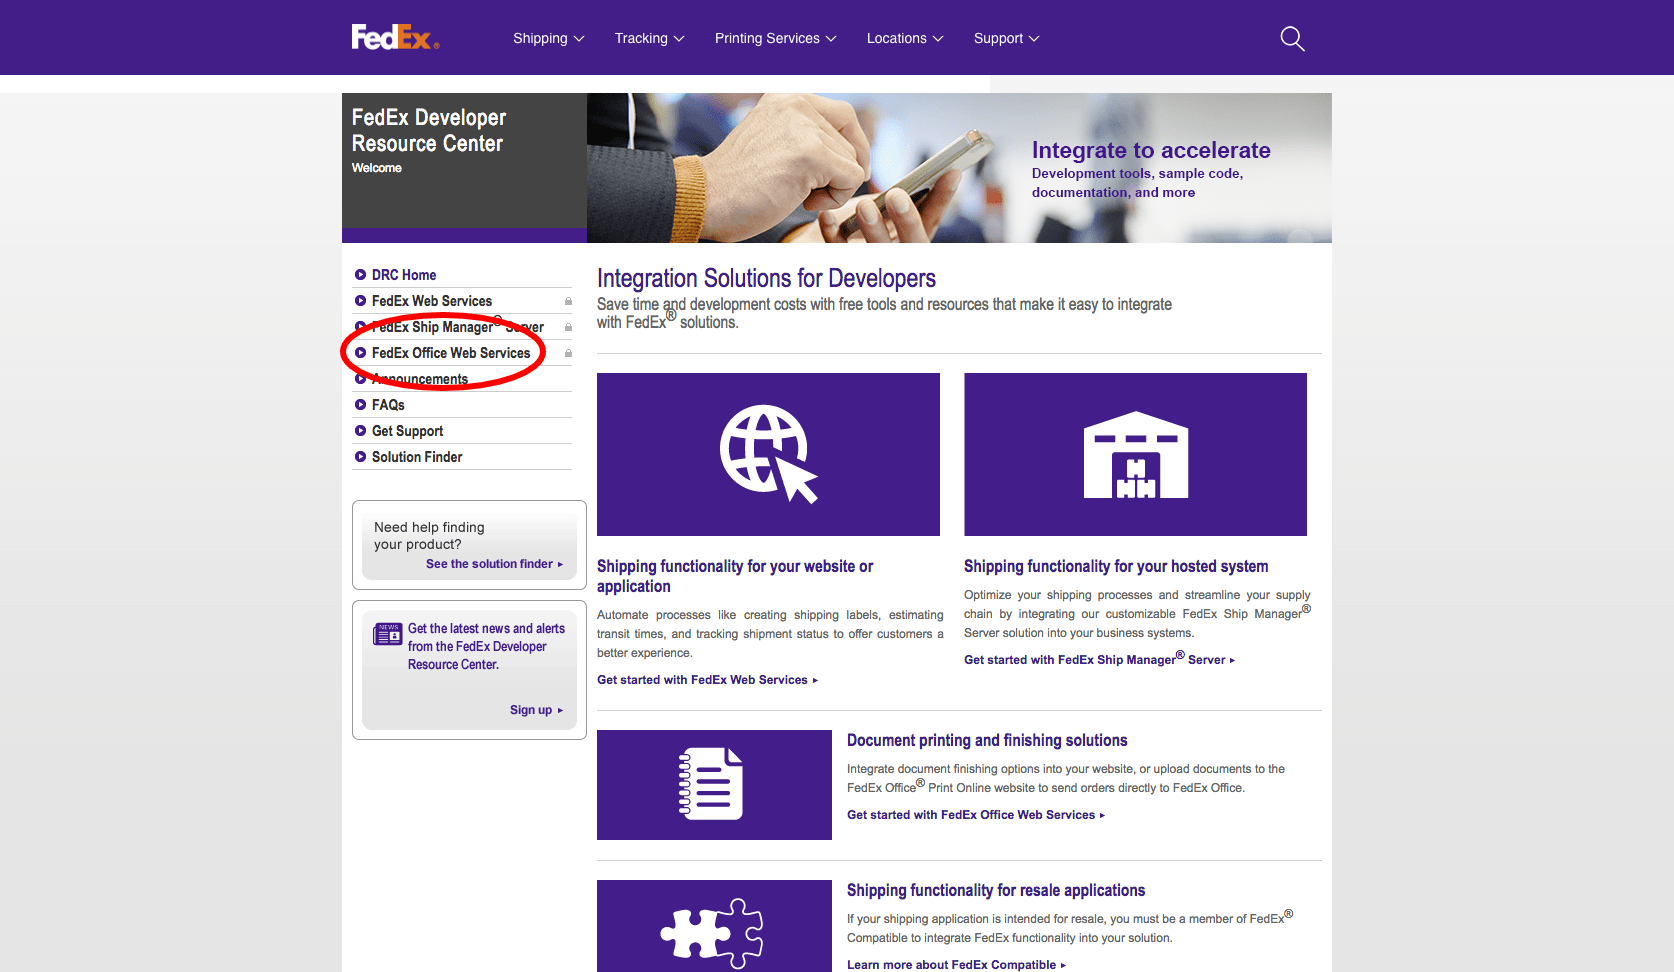 FedEx Web Services